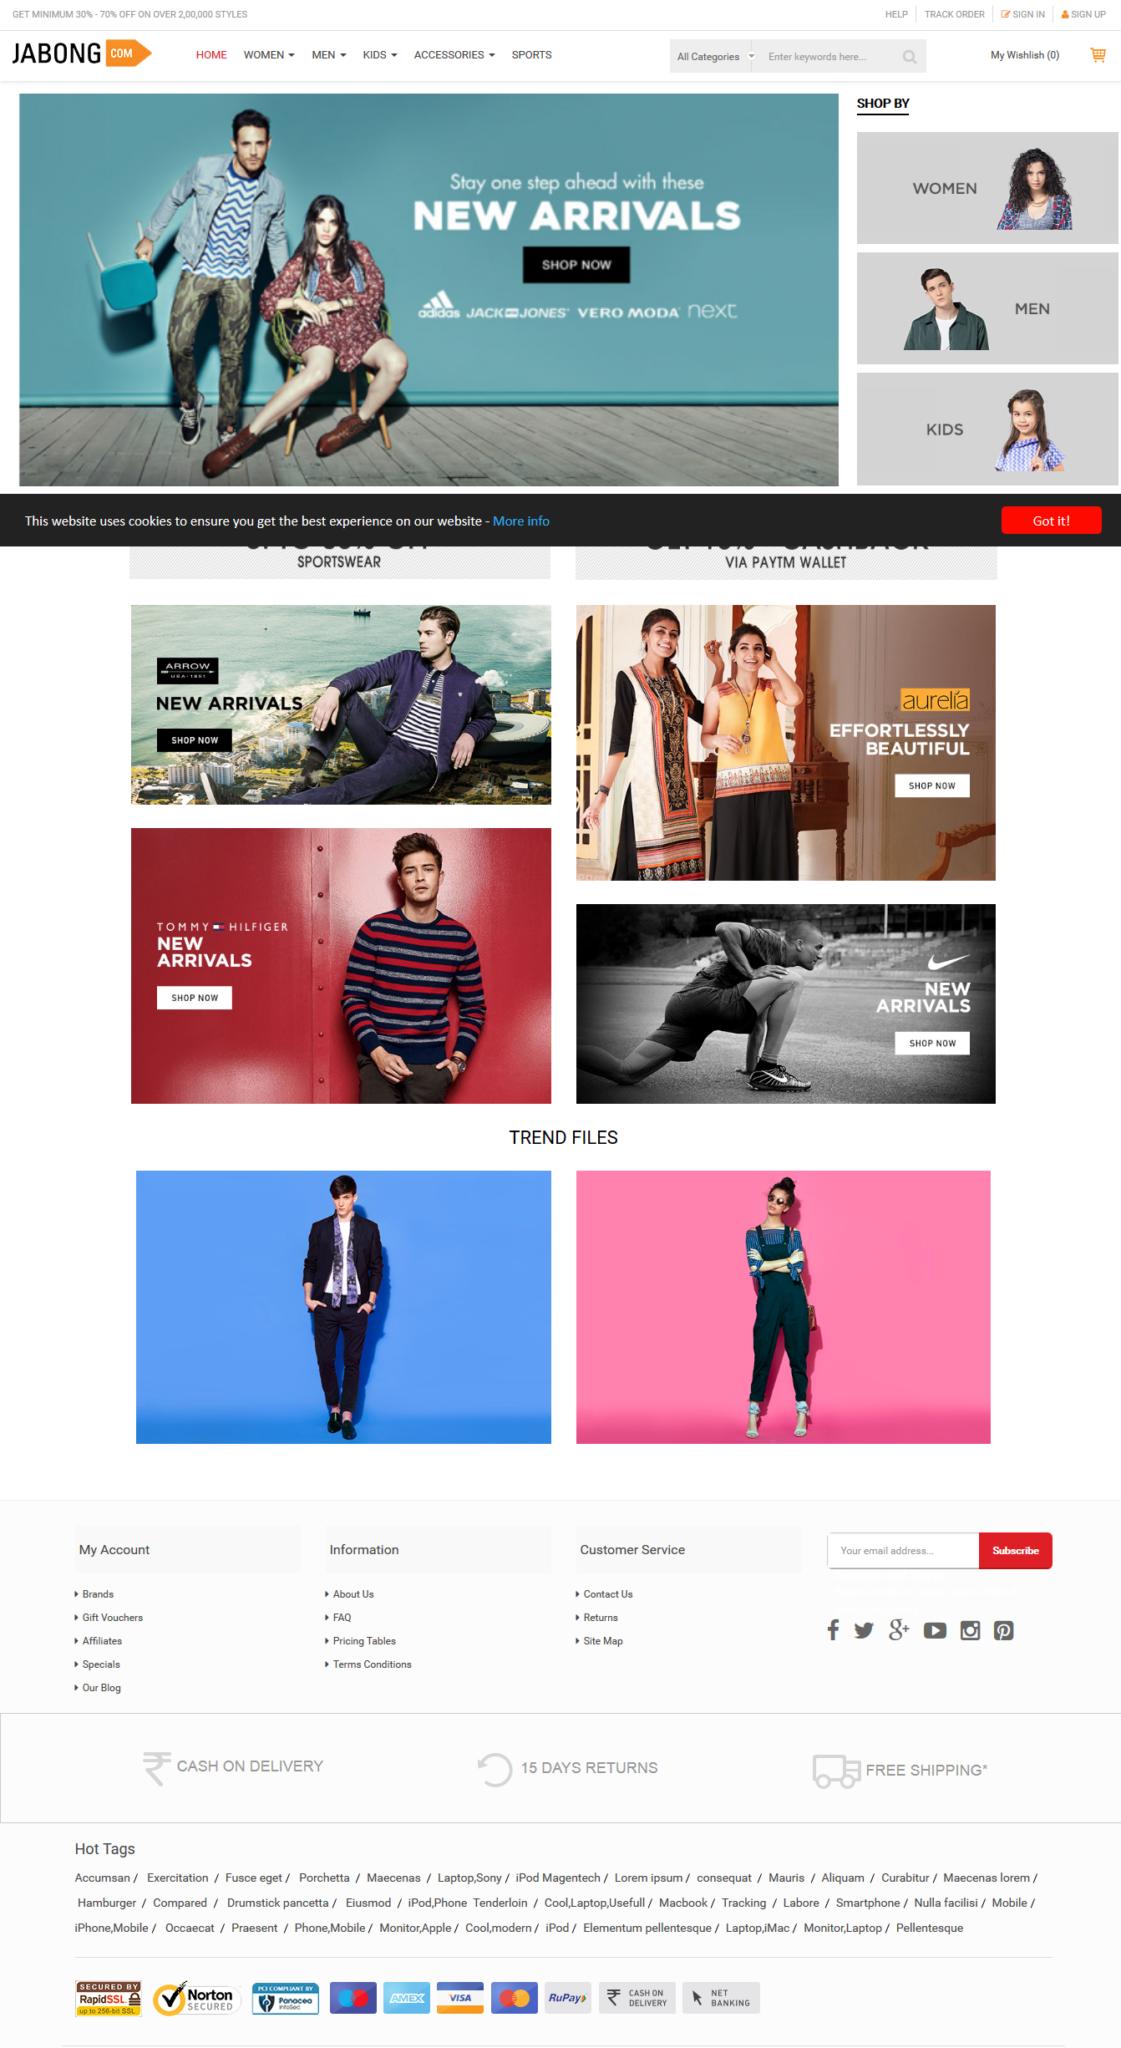 jabong-user-homepage